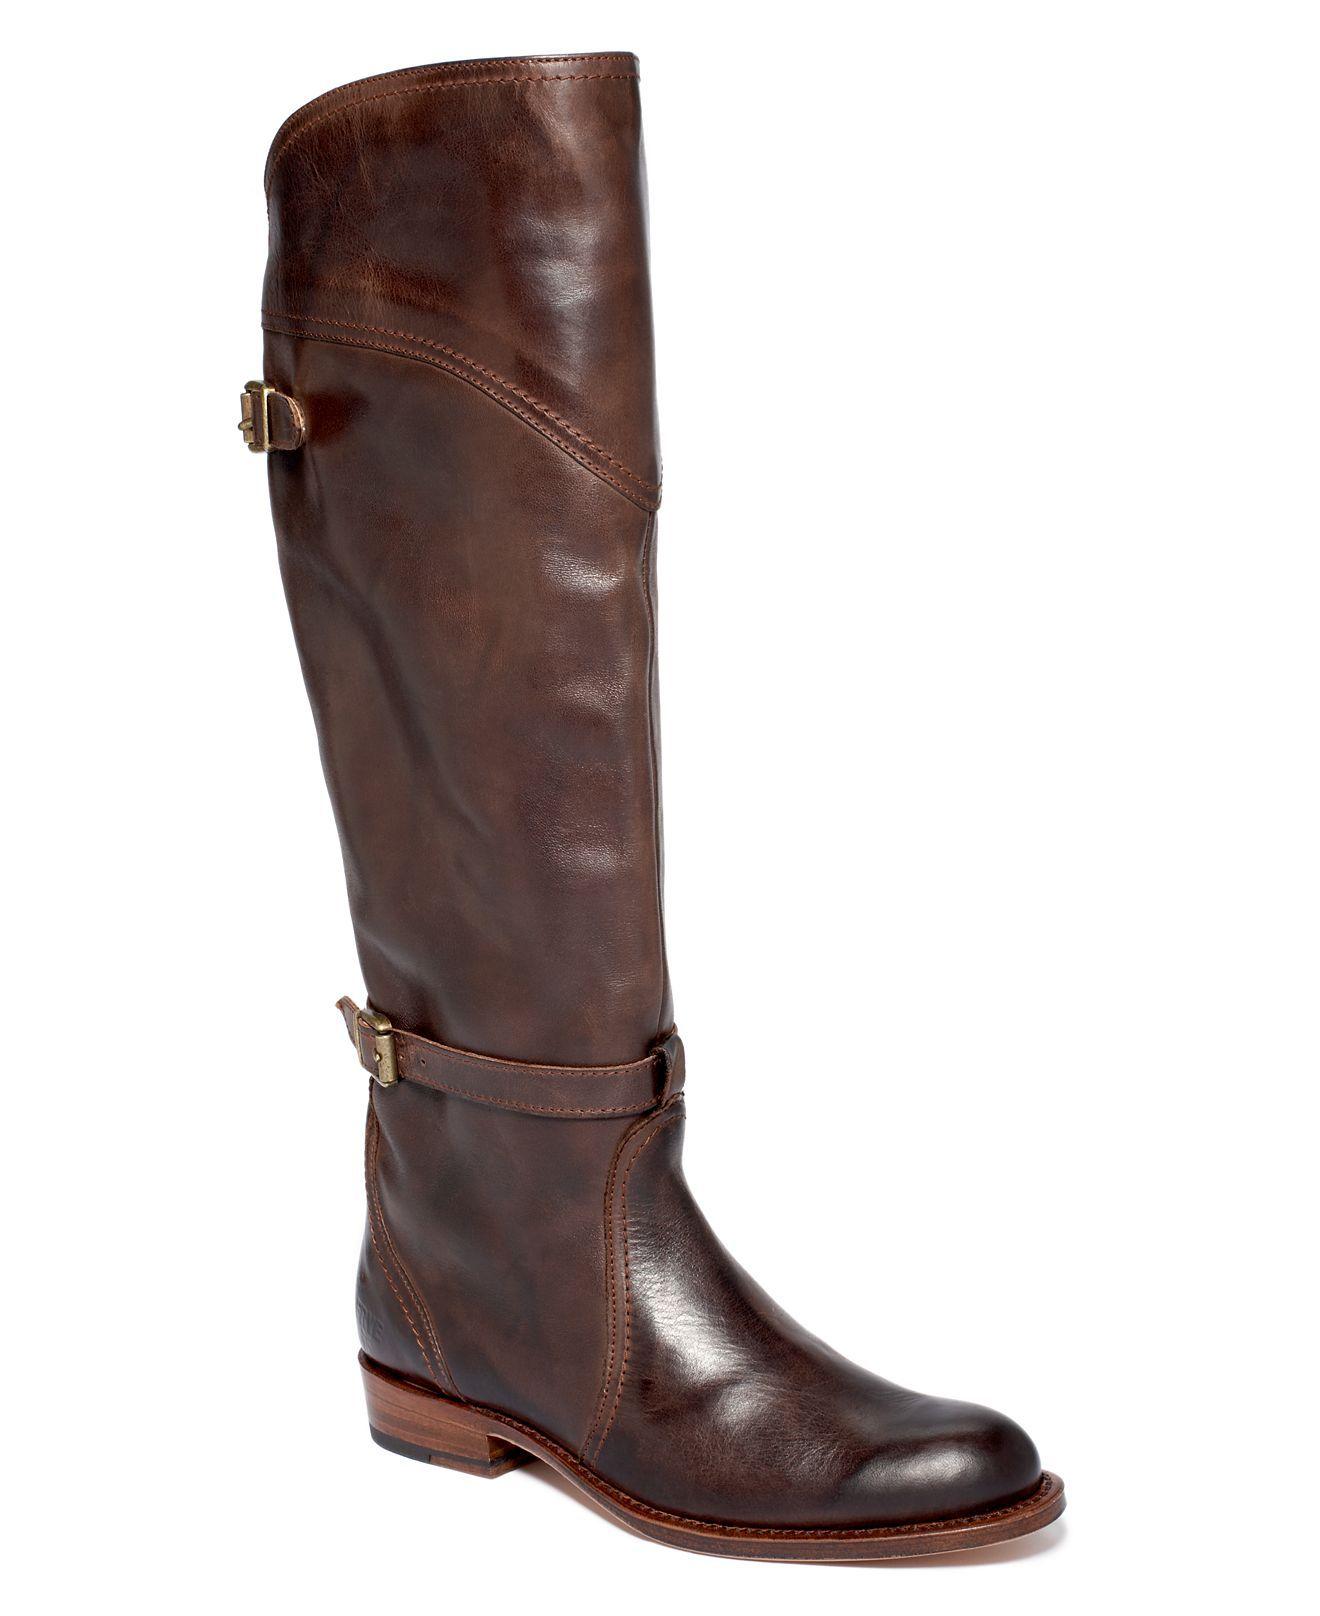 Frye Boots :: Dorado Riding Boot :: $458 :: Macy's